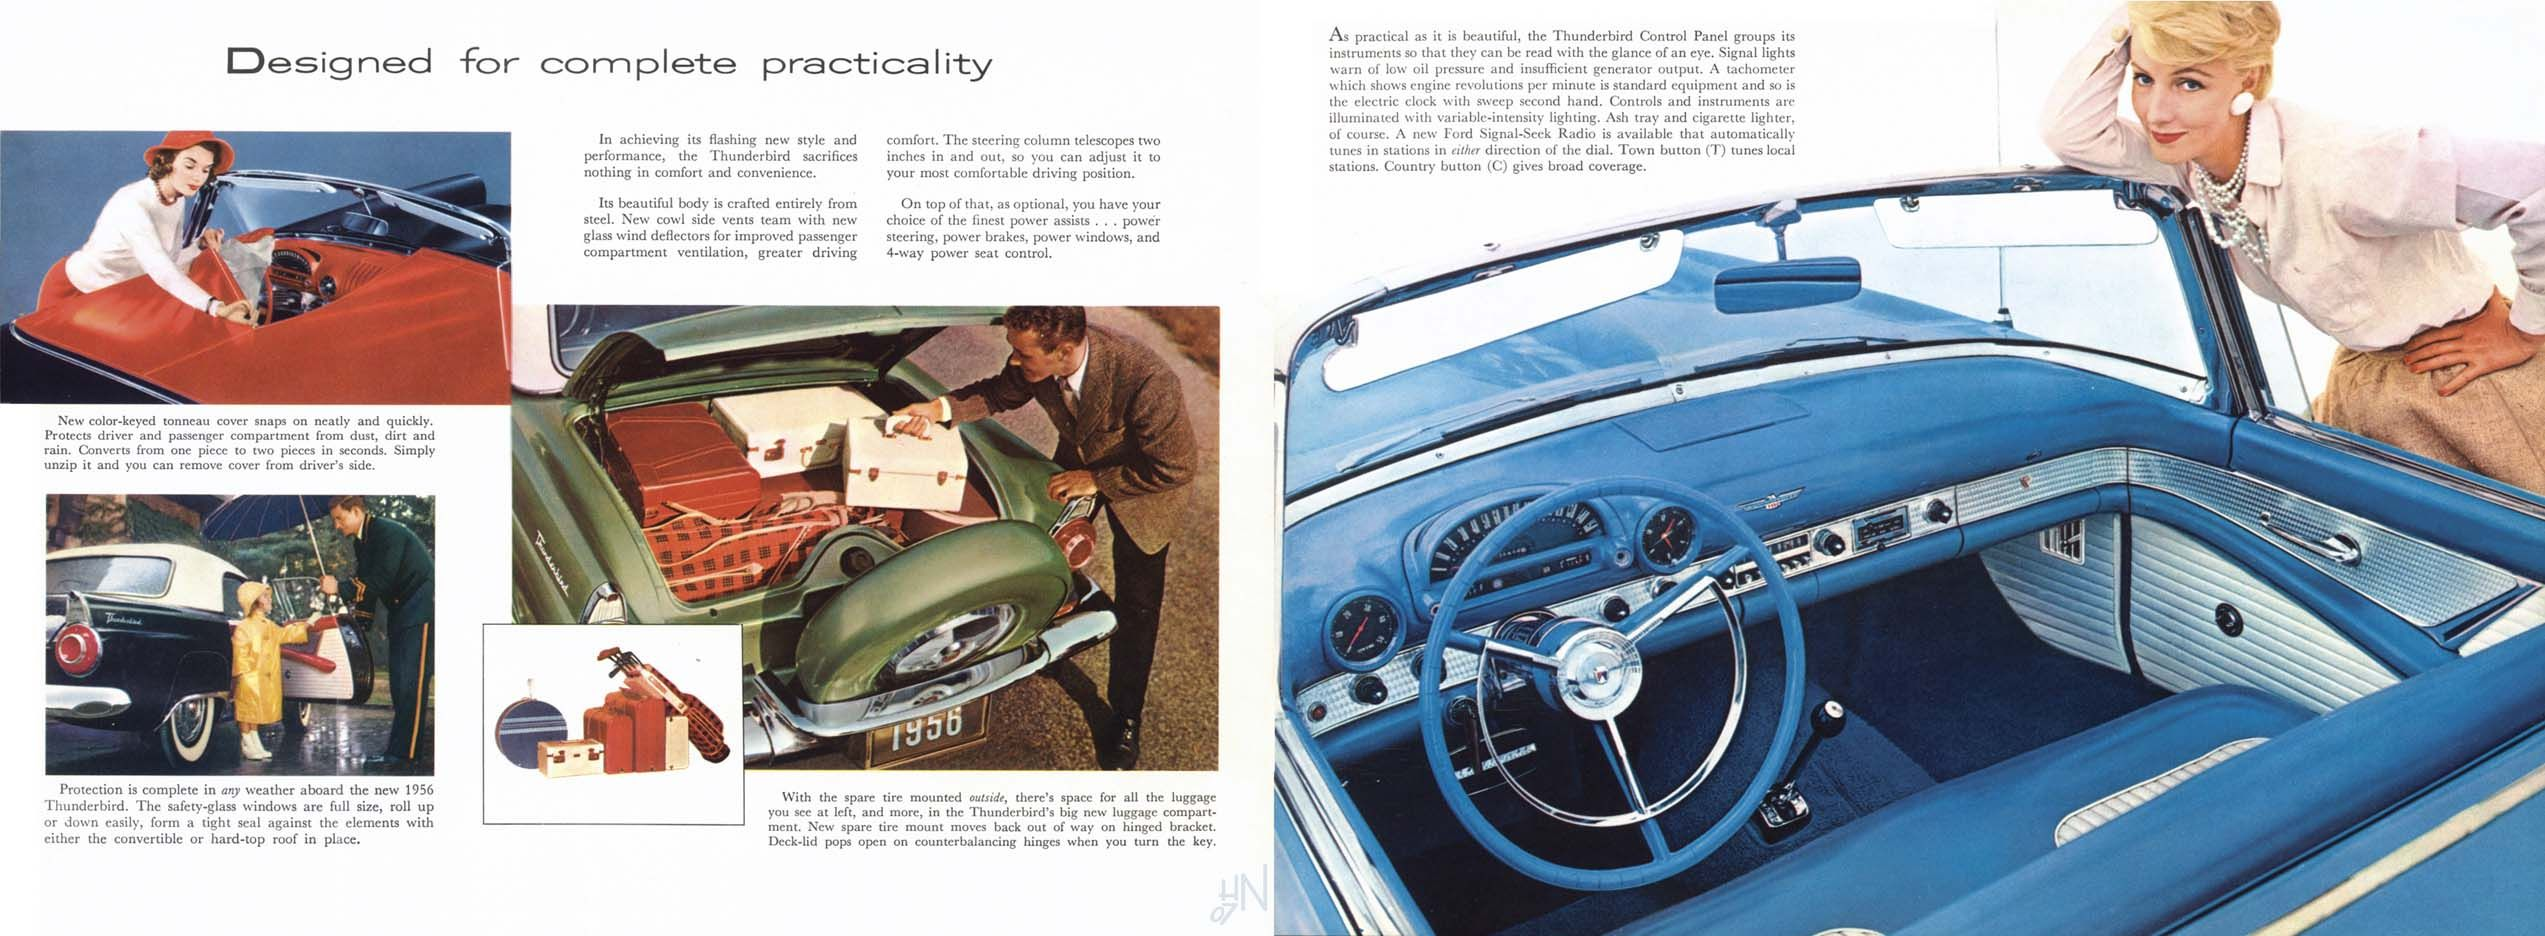 1956 Ford Thunderbird-12-13